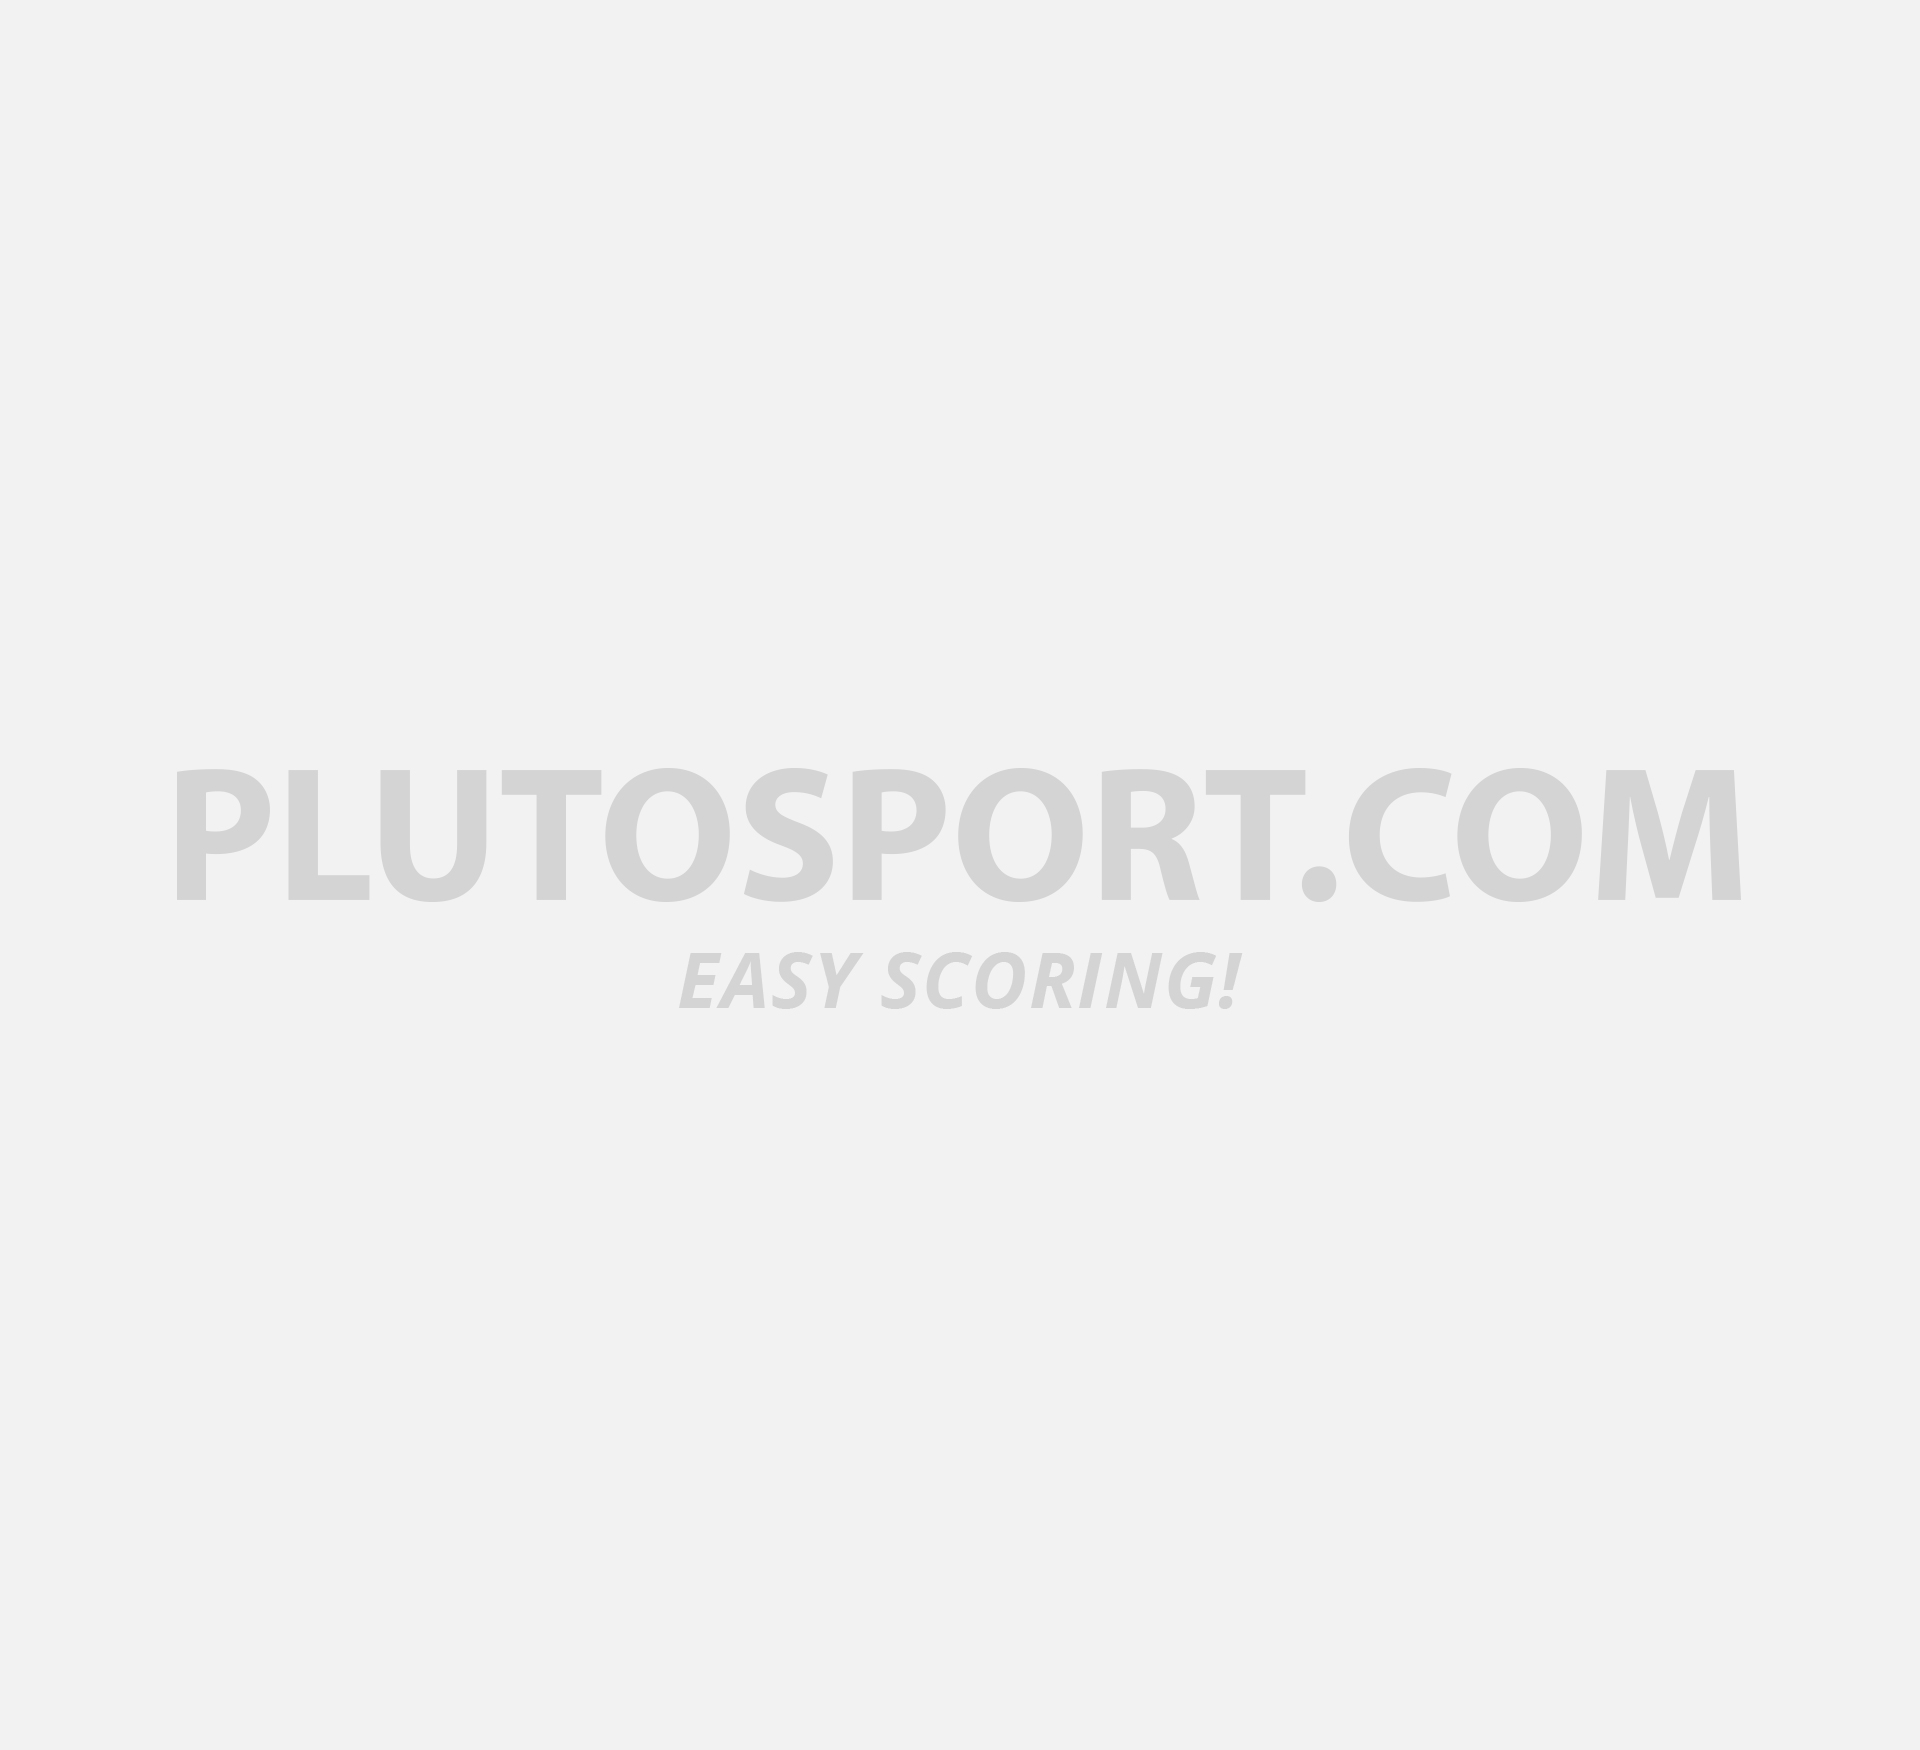 de9e95363 Puma Red Bull Racing New Block Cap - Caps - Accessories - Lifestyle -  Sports | Plutosport